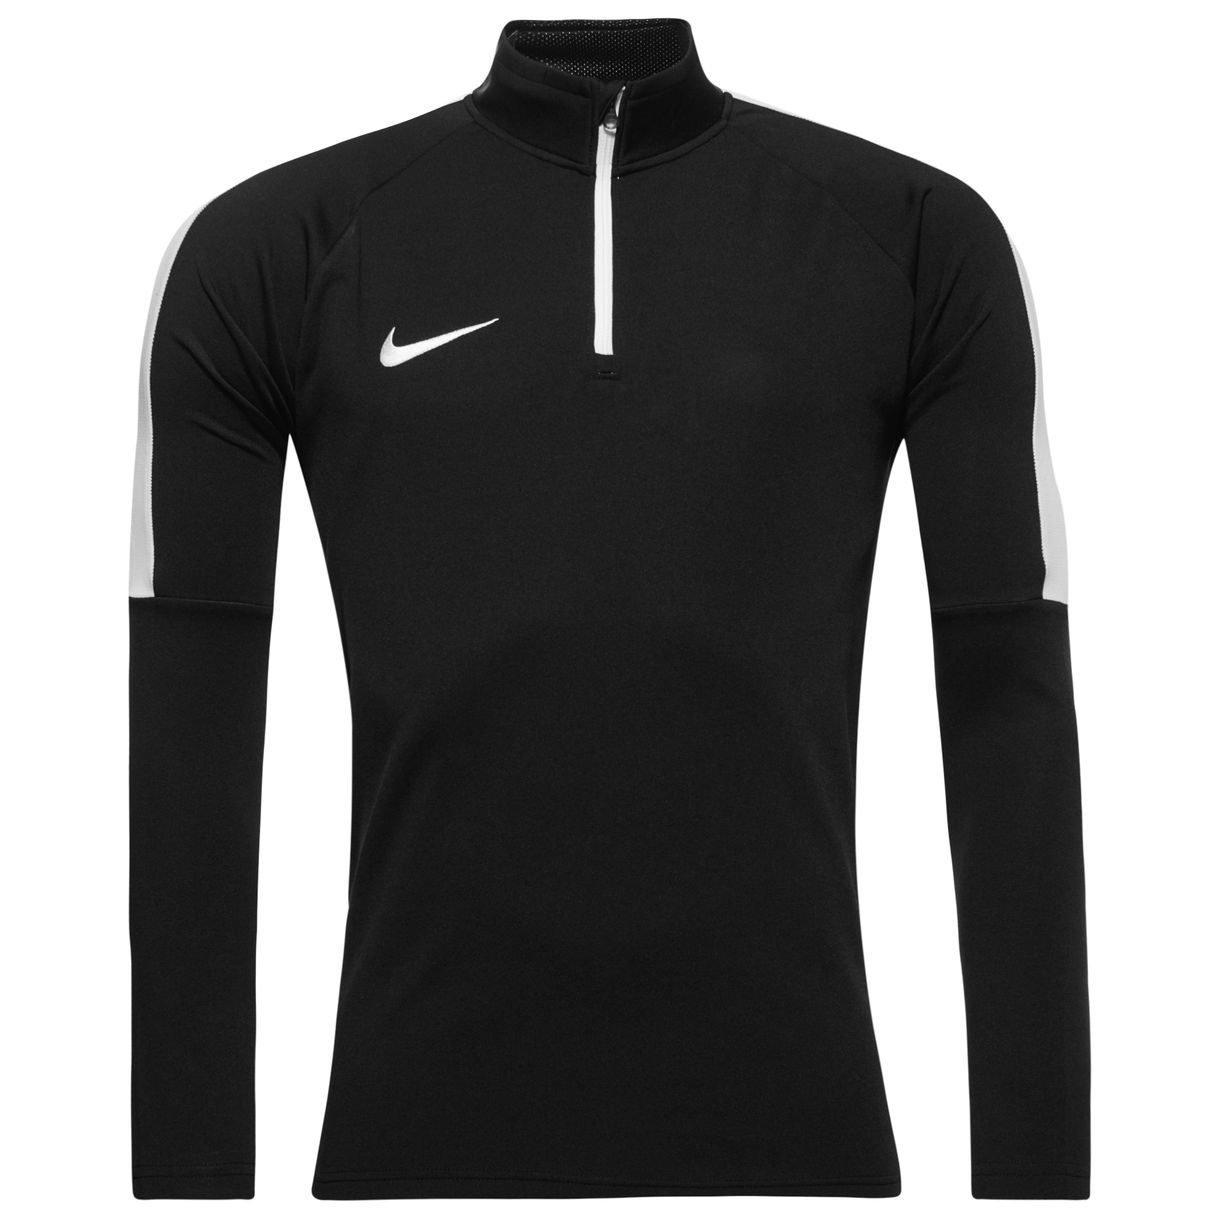 Nike Mens Dry Academy Half Zip Drill Top (Black)